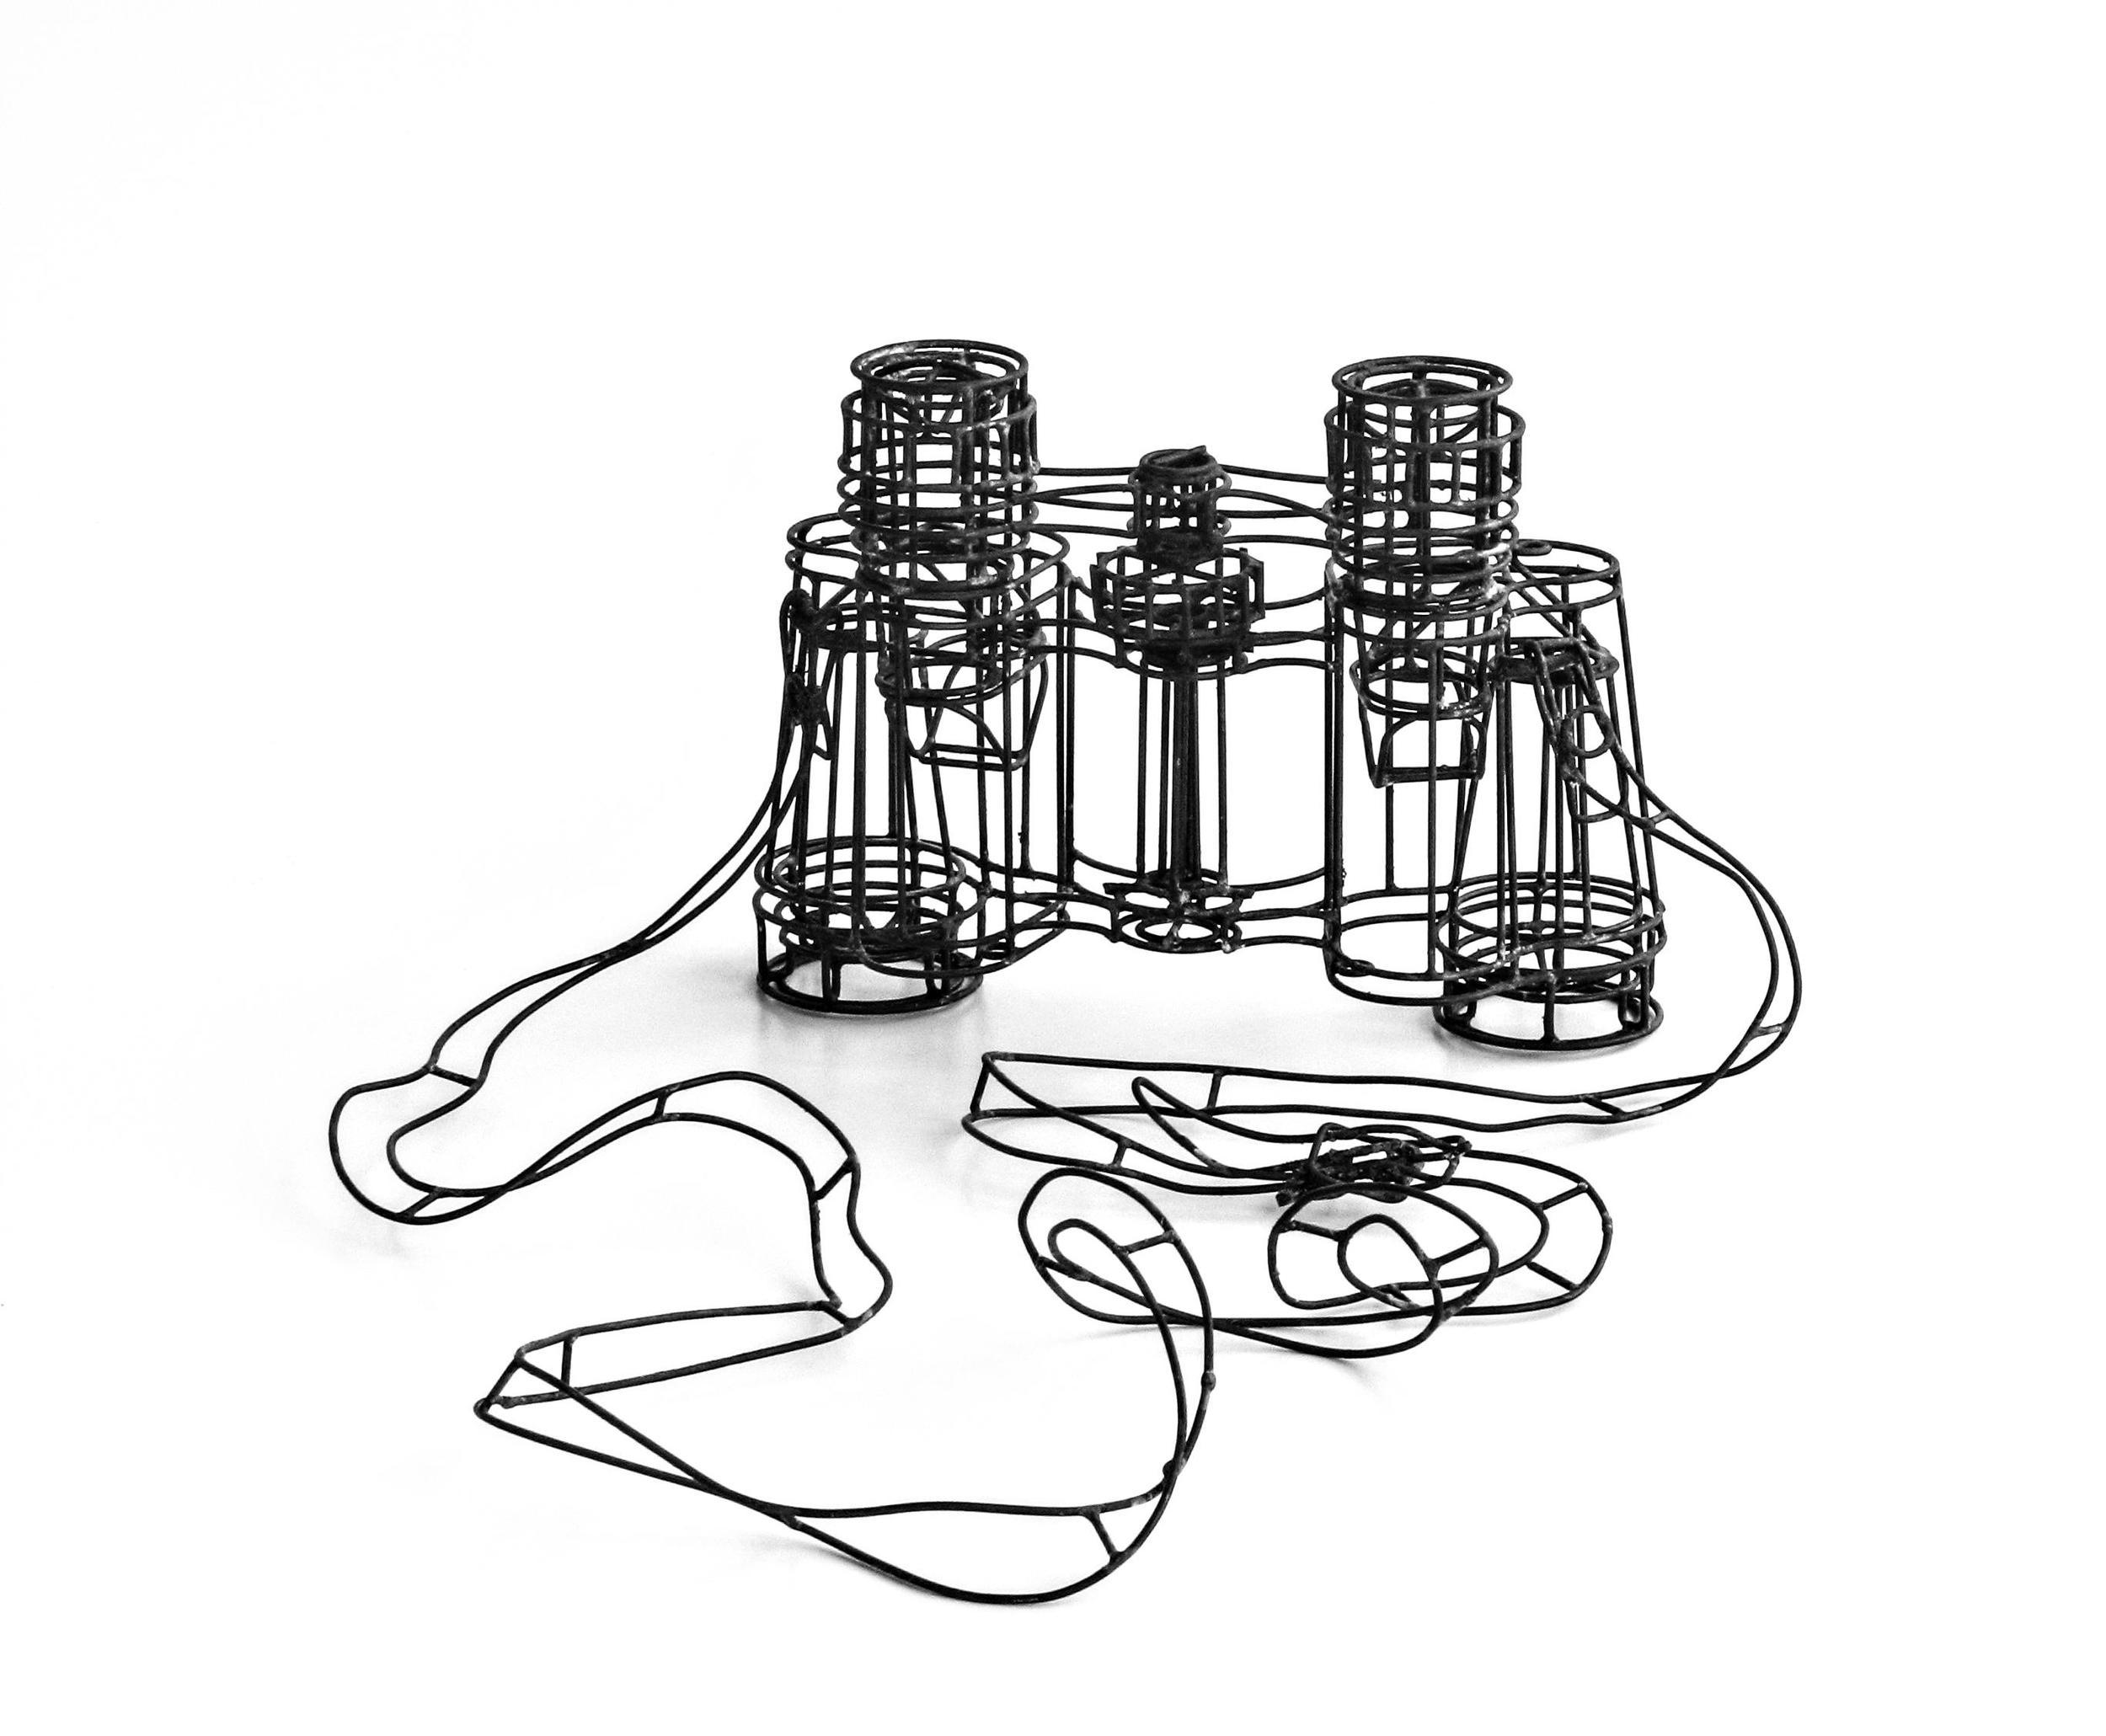 Binoculars, 2011, Thomas Raschke, Soldered Iron Wire 12x29x24cm